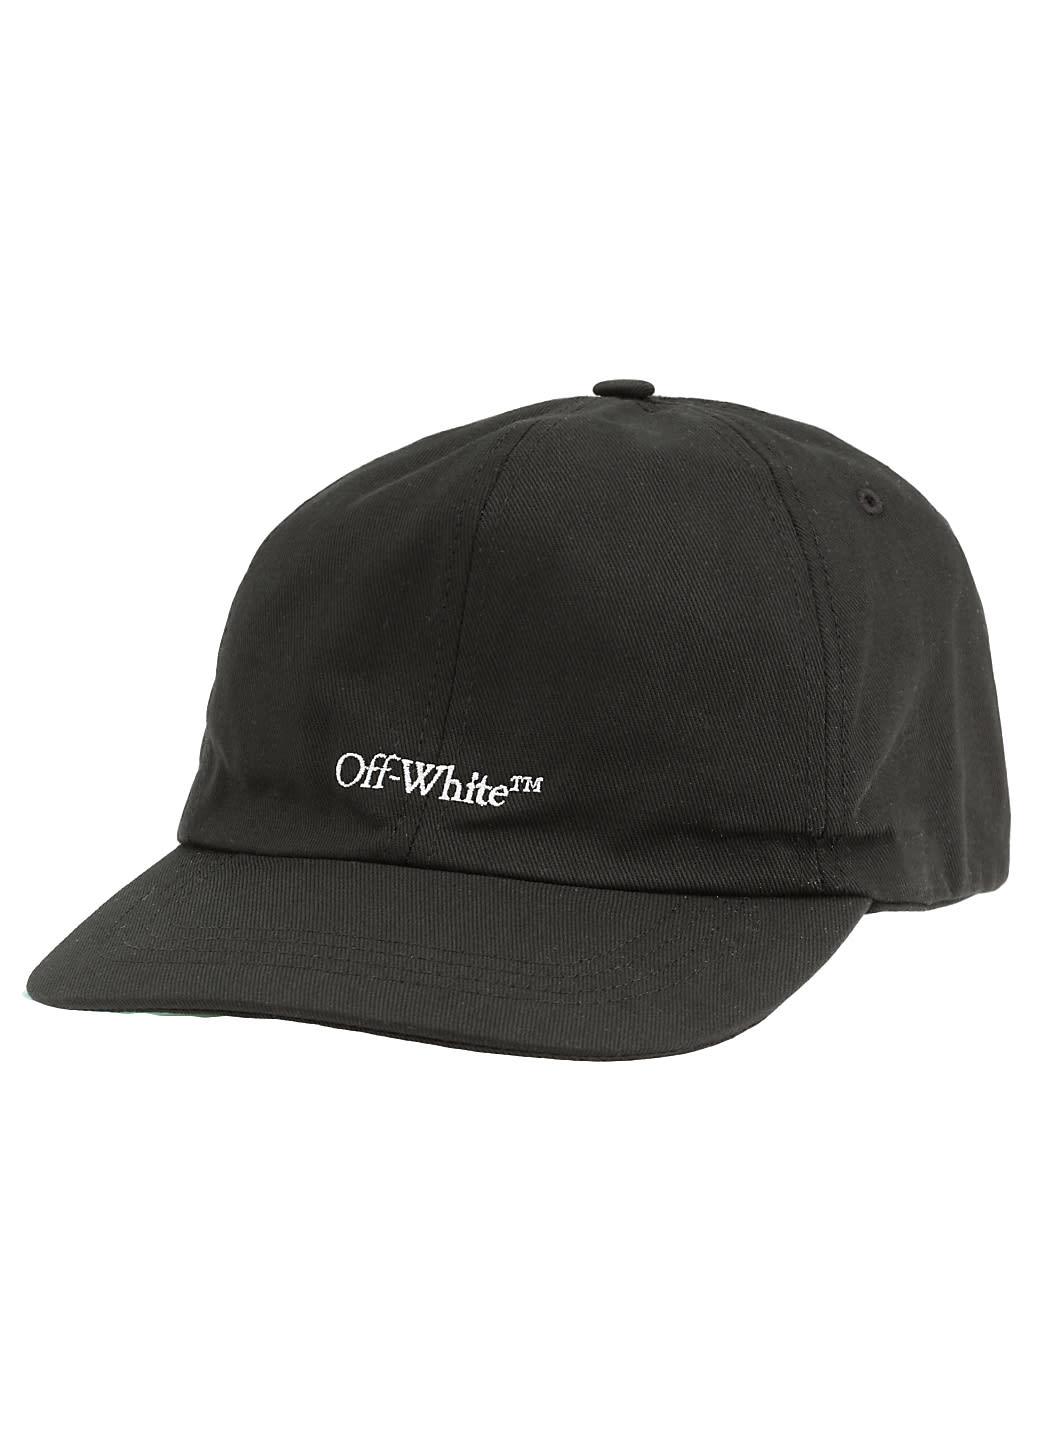 OFF-WHITE COTTON HAT